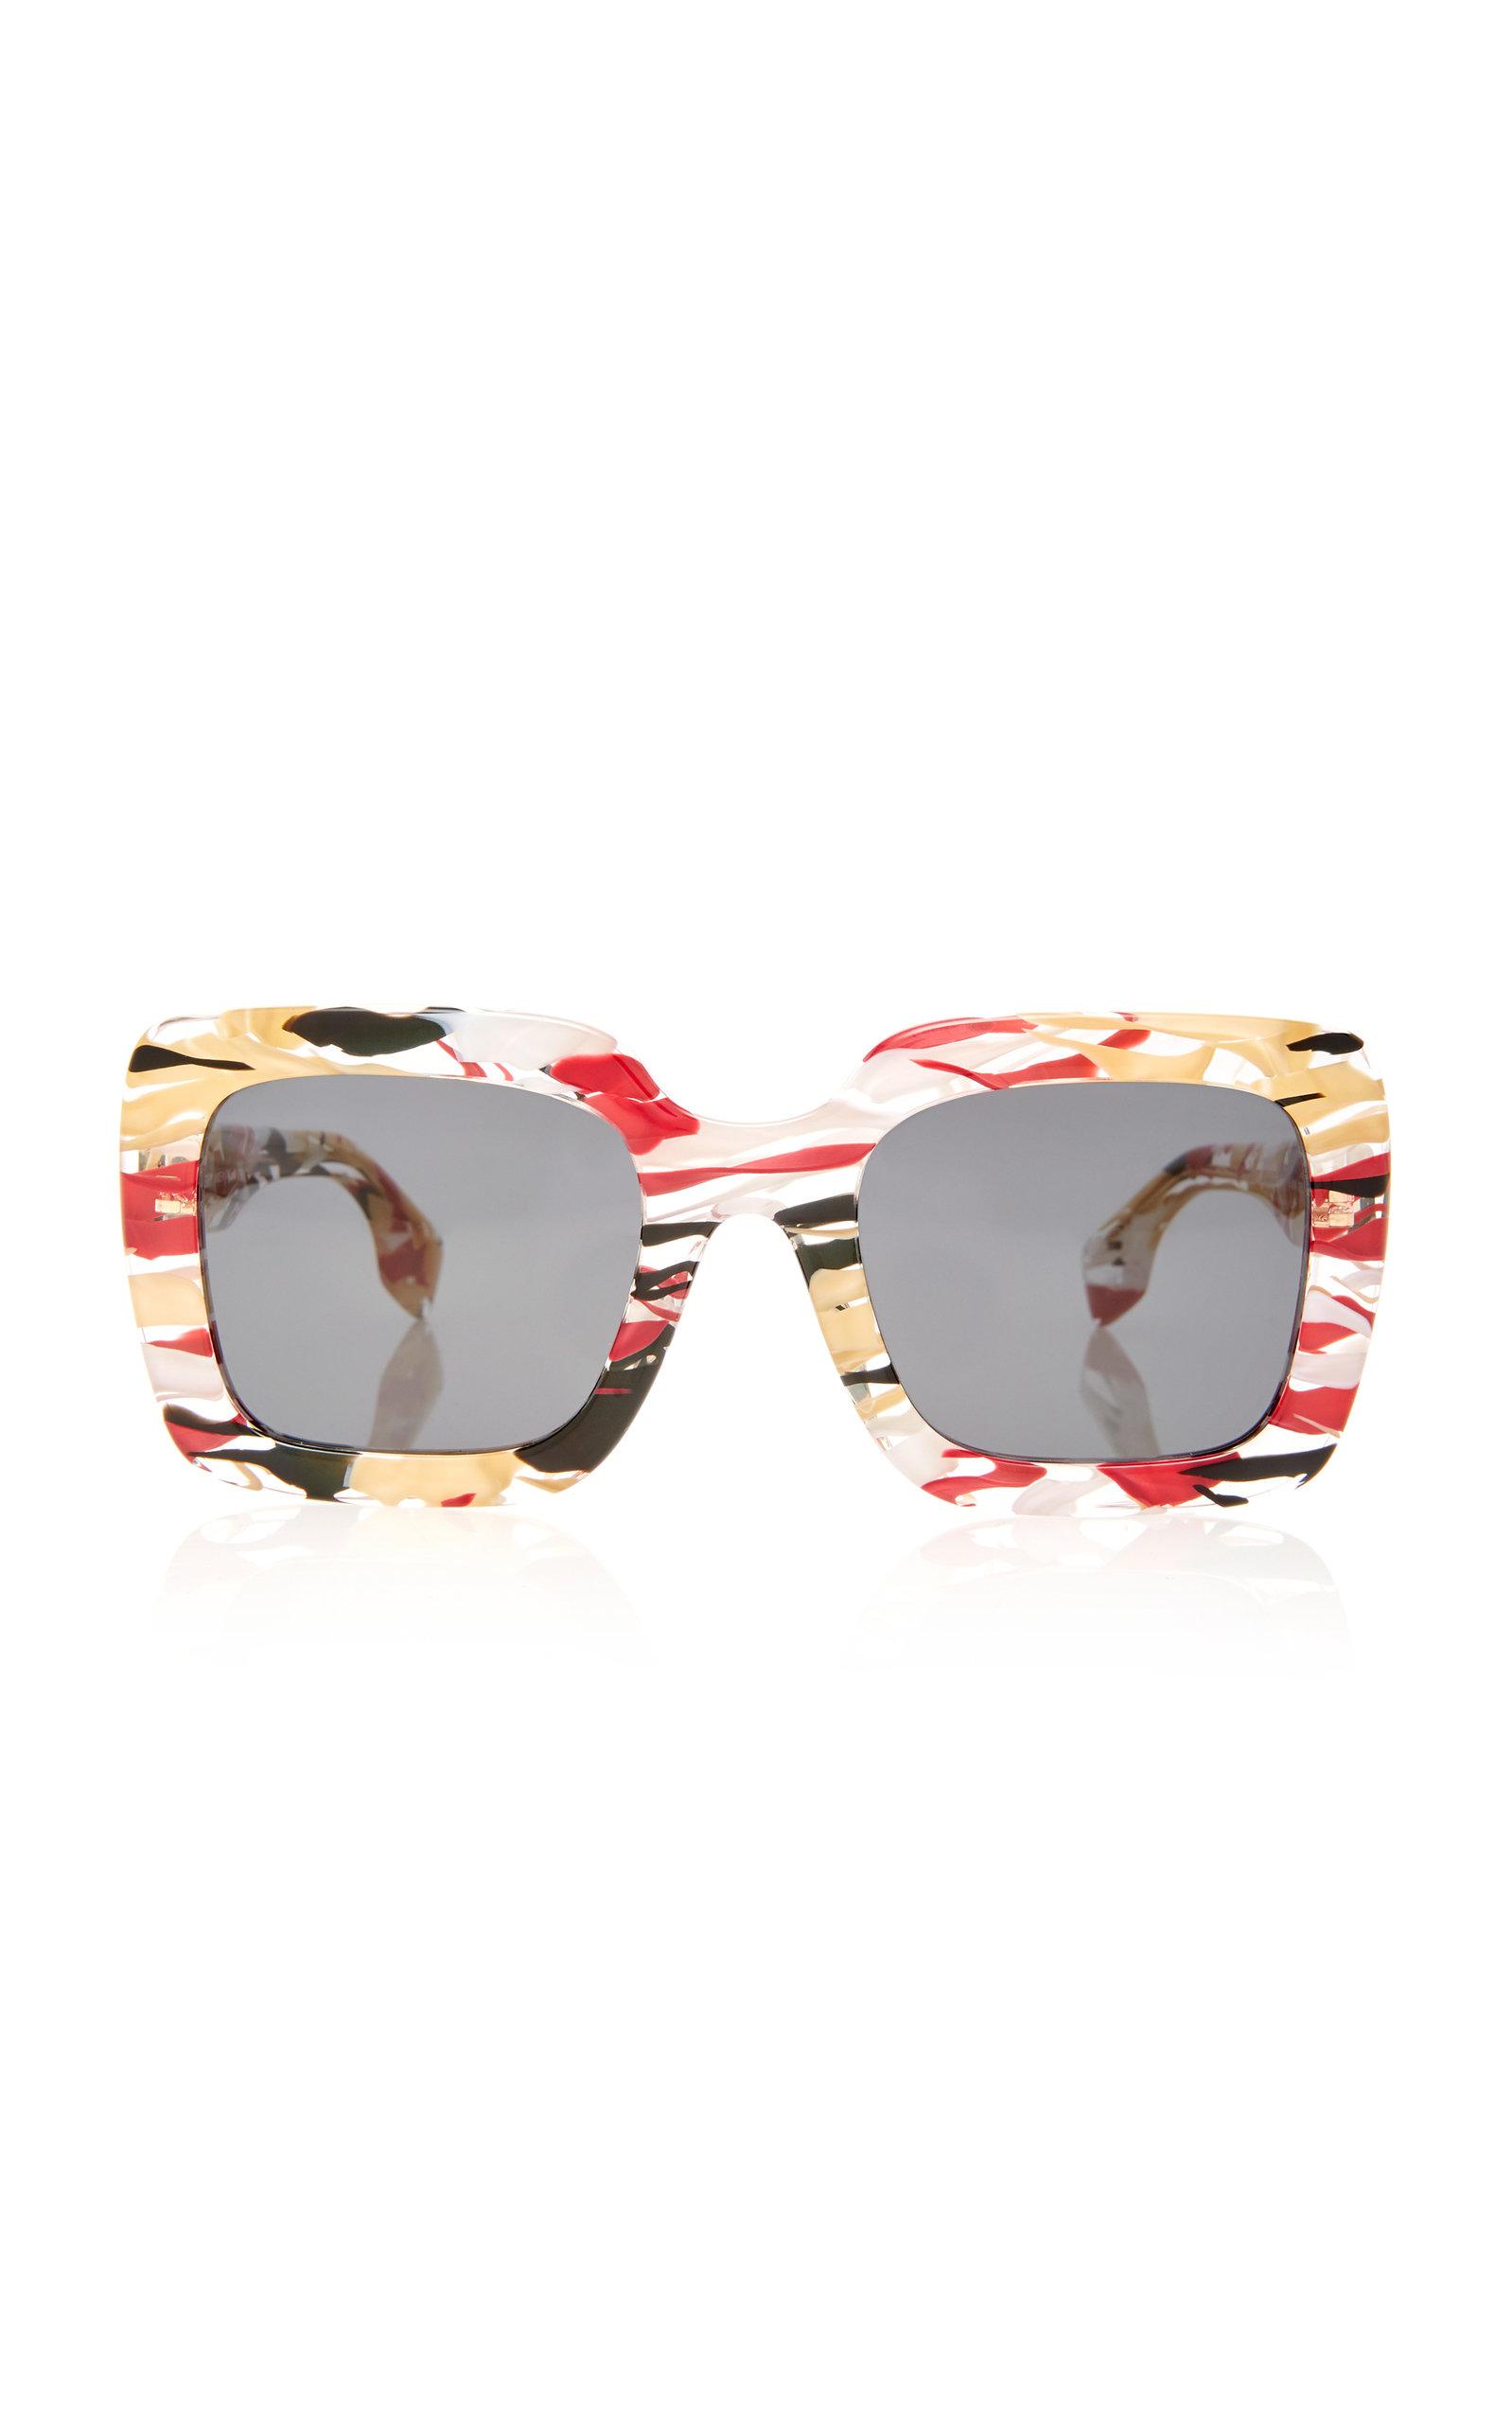 966308b66a34 Burberry SunglassesSquare-Frame Marbled Acetate Sunglasses. CLOSE. Loading